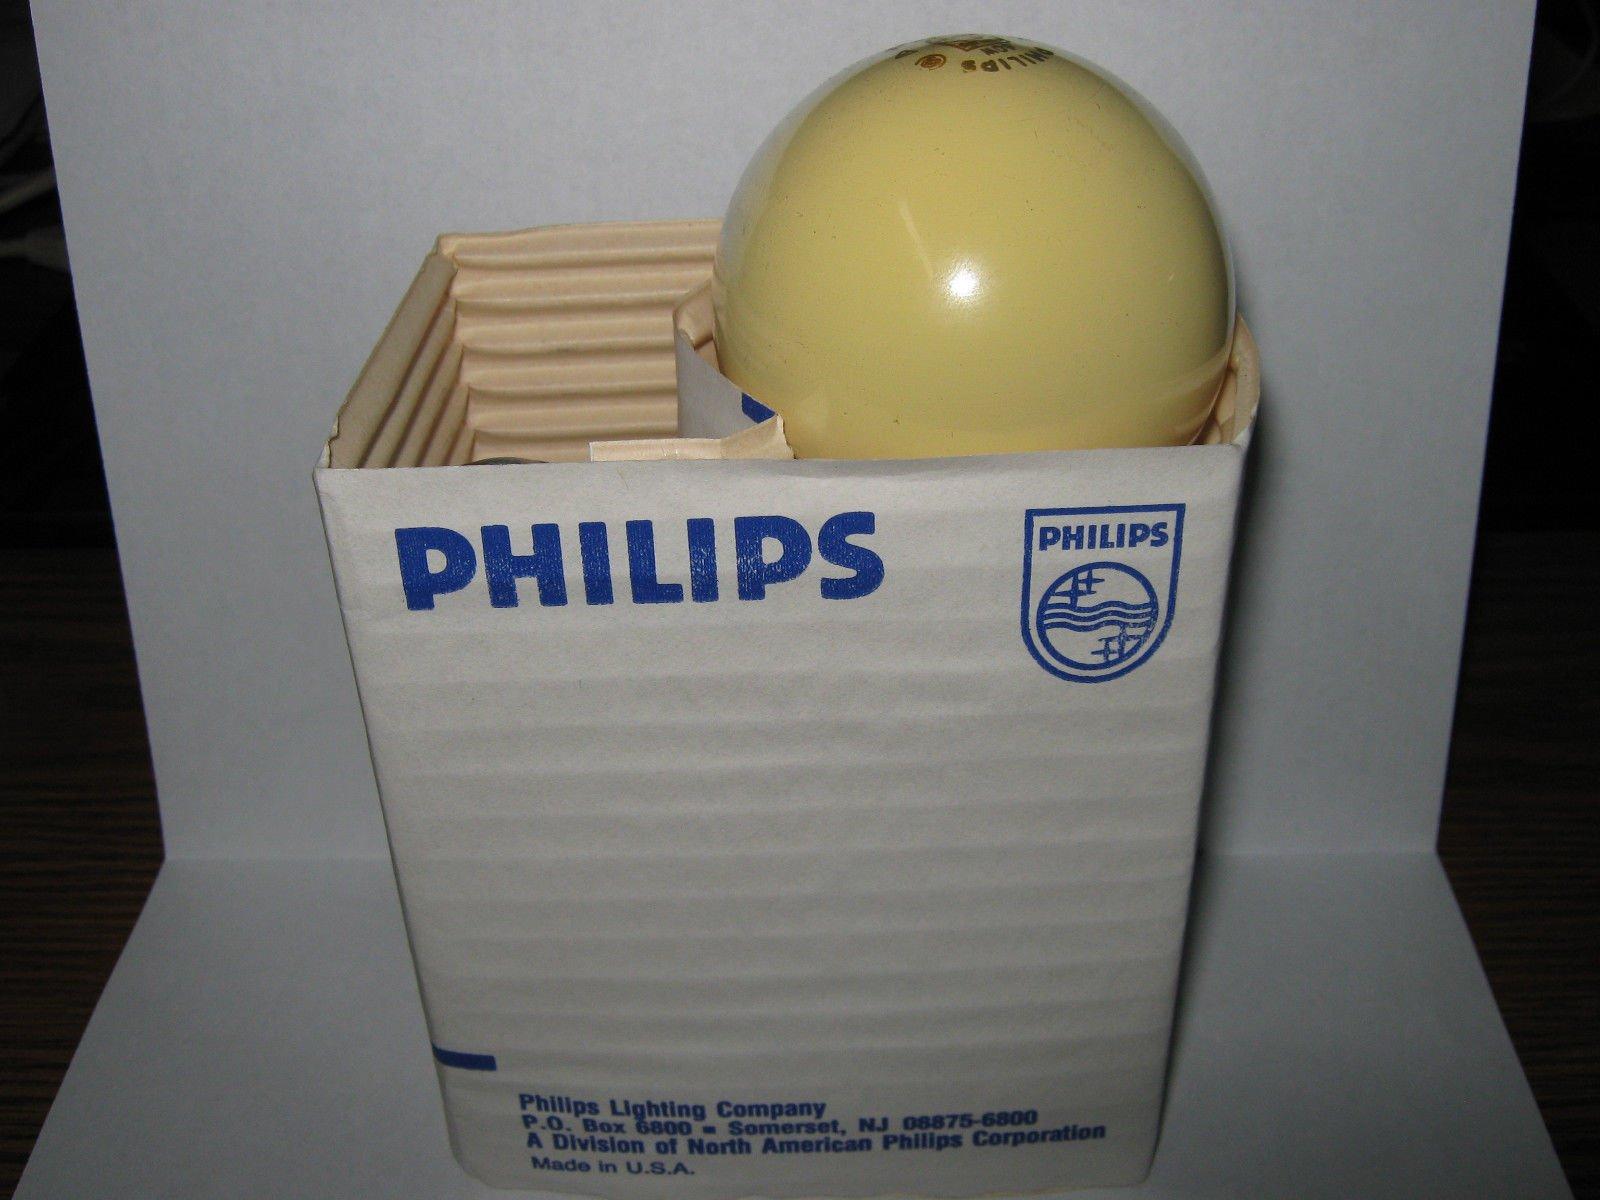 120 box, Philips 60 watt Bug Light, Yellow Incandescent Bulb, 60A/Y, 120V,